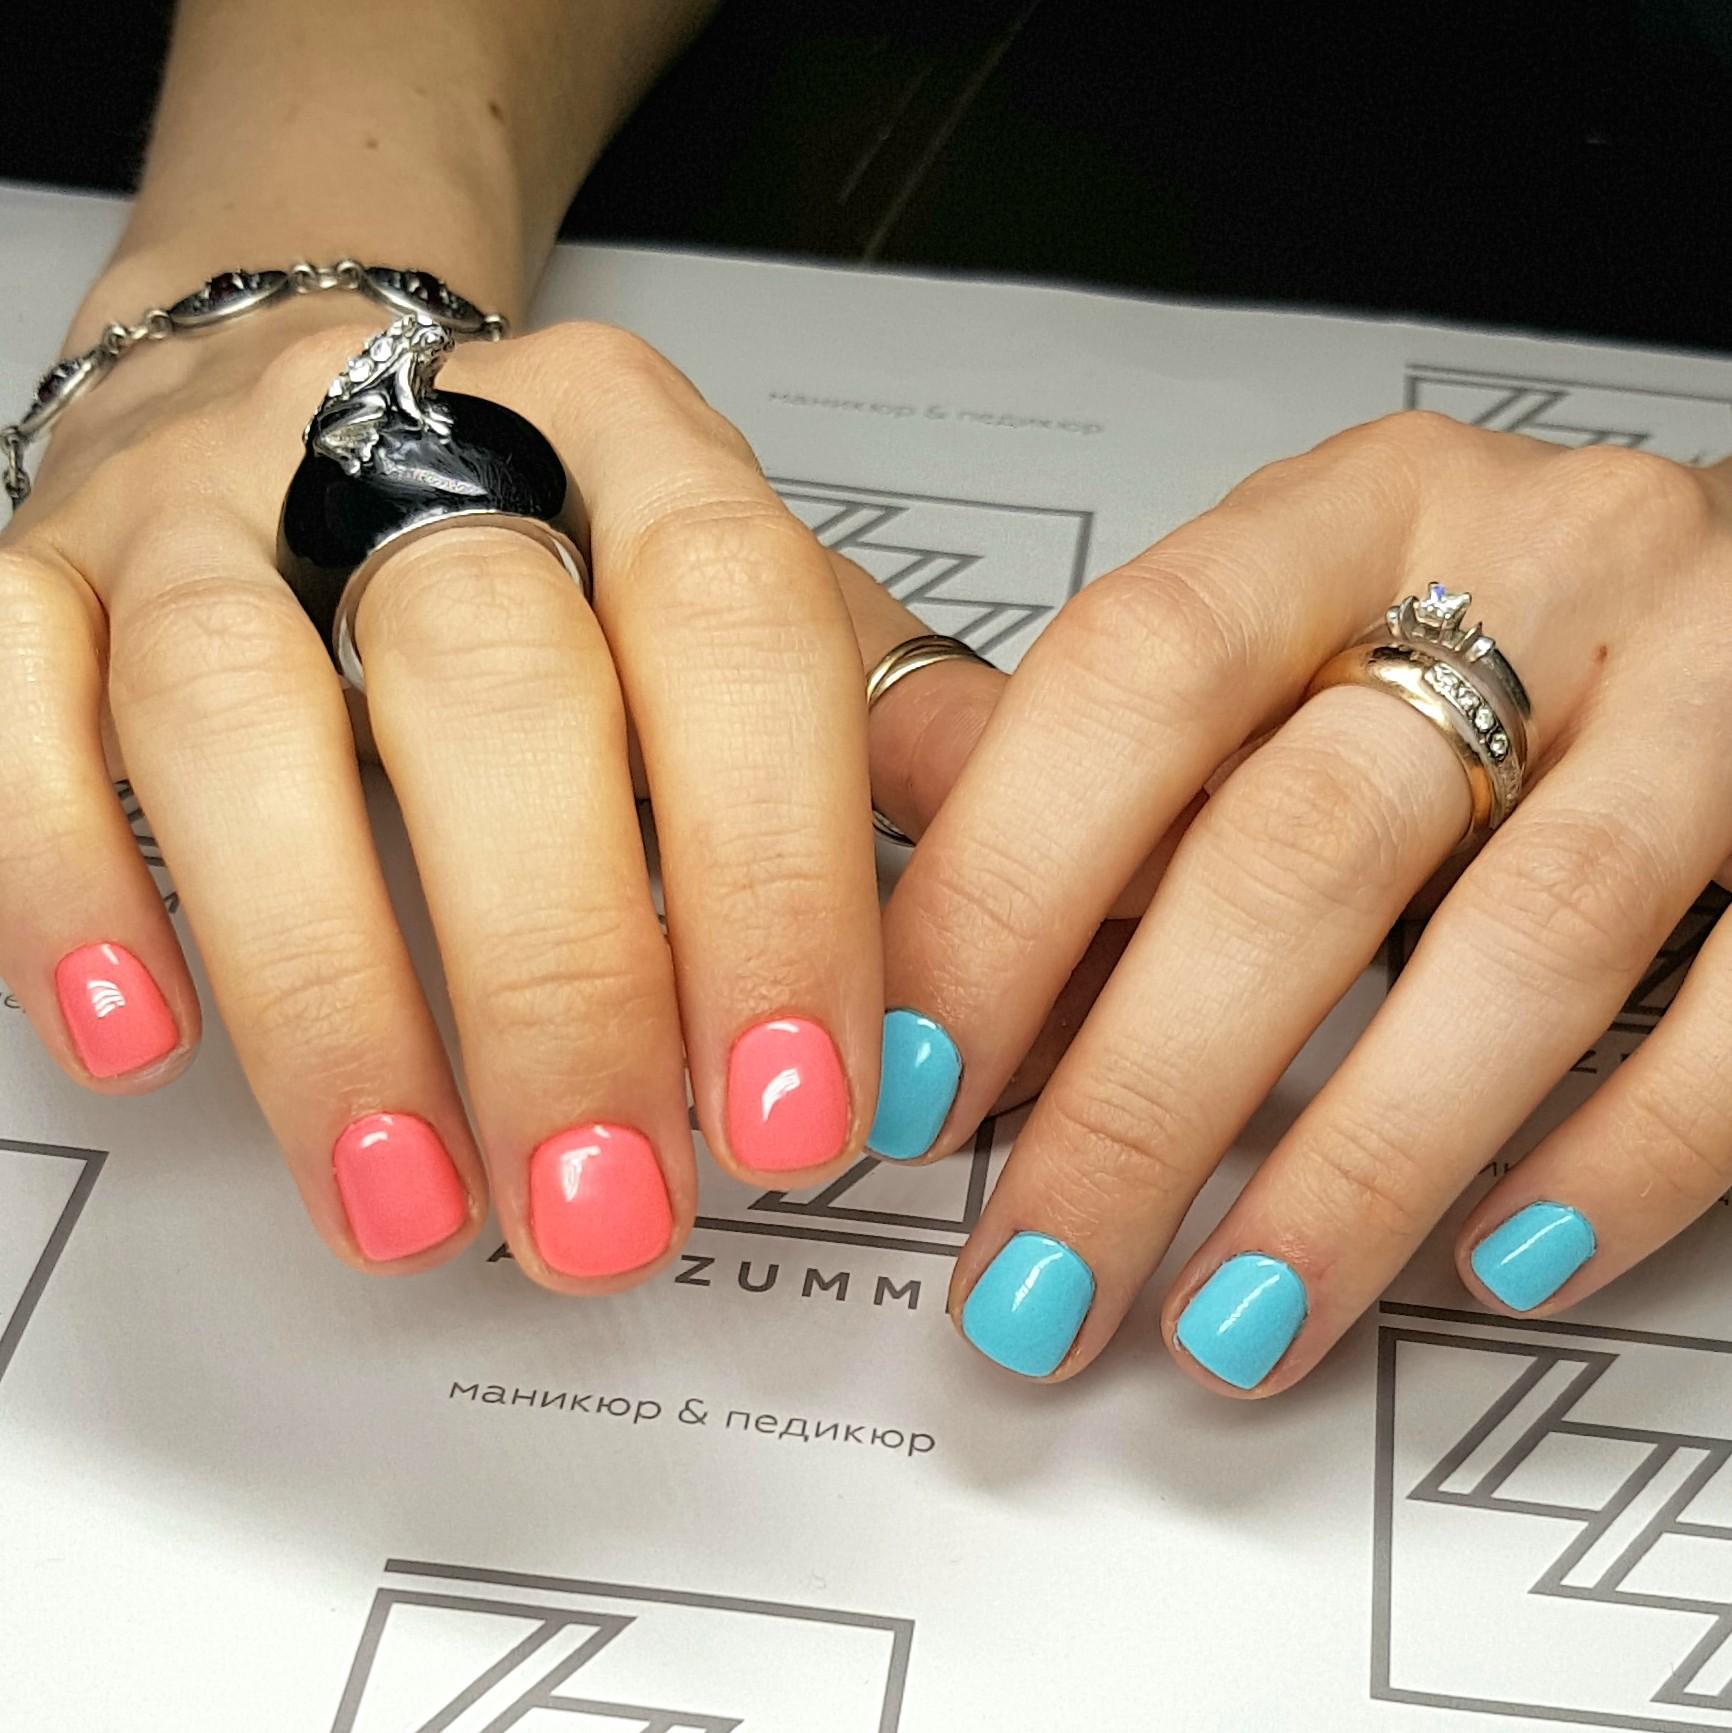 Azzzummi_nails_ 1905_розовыйиголубой